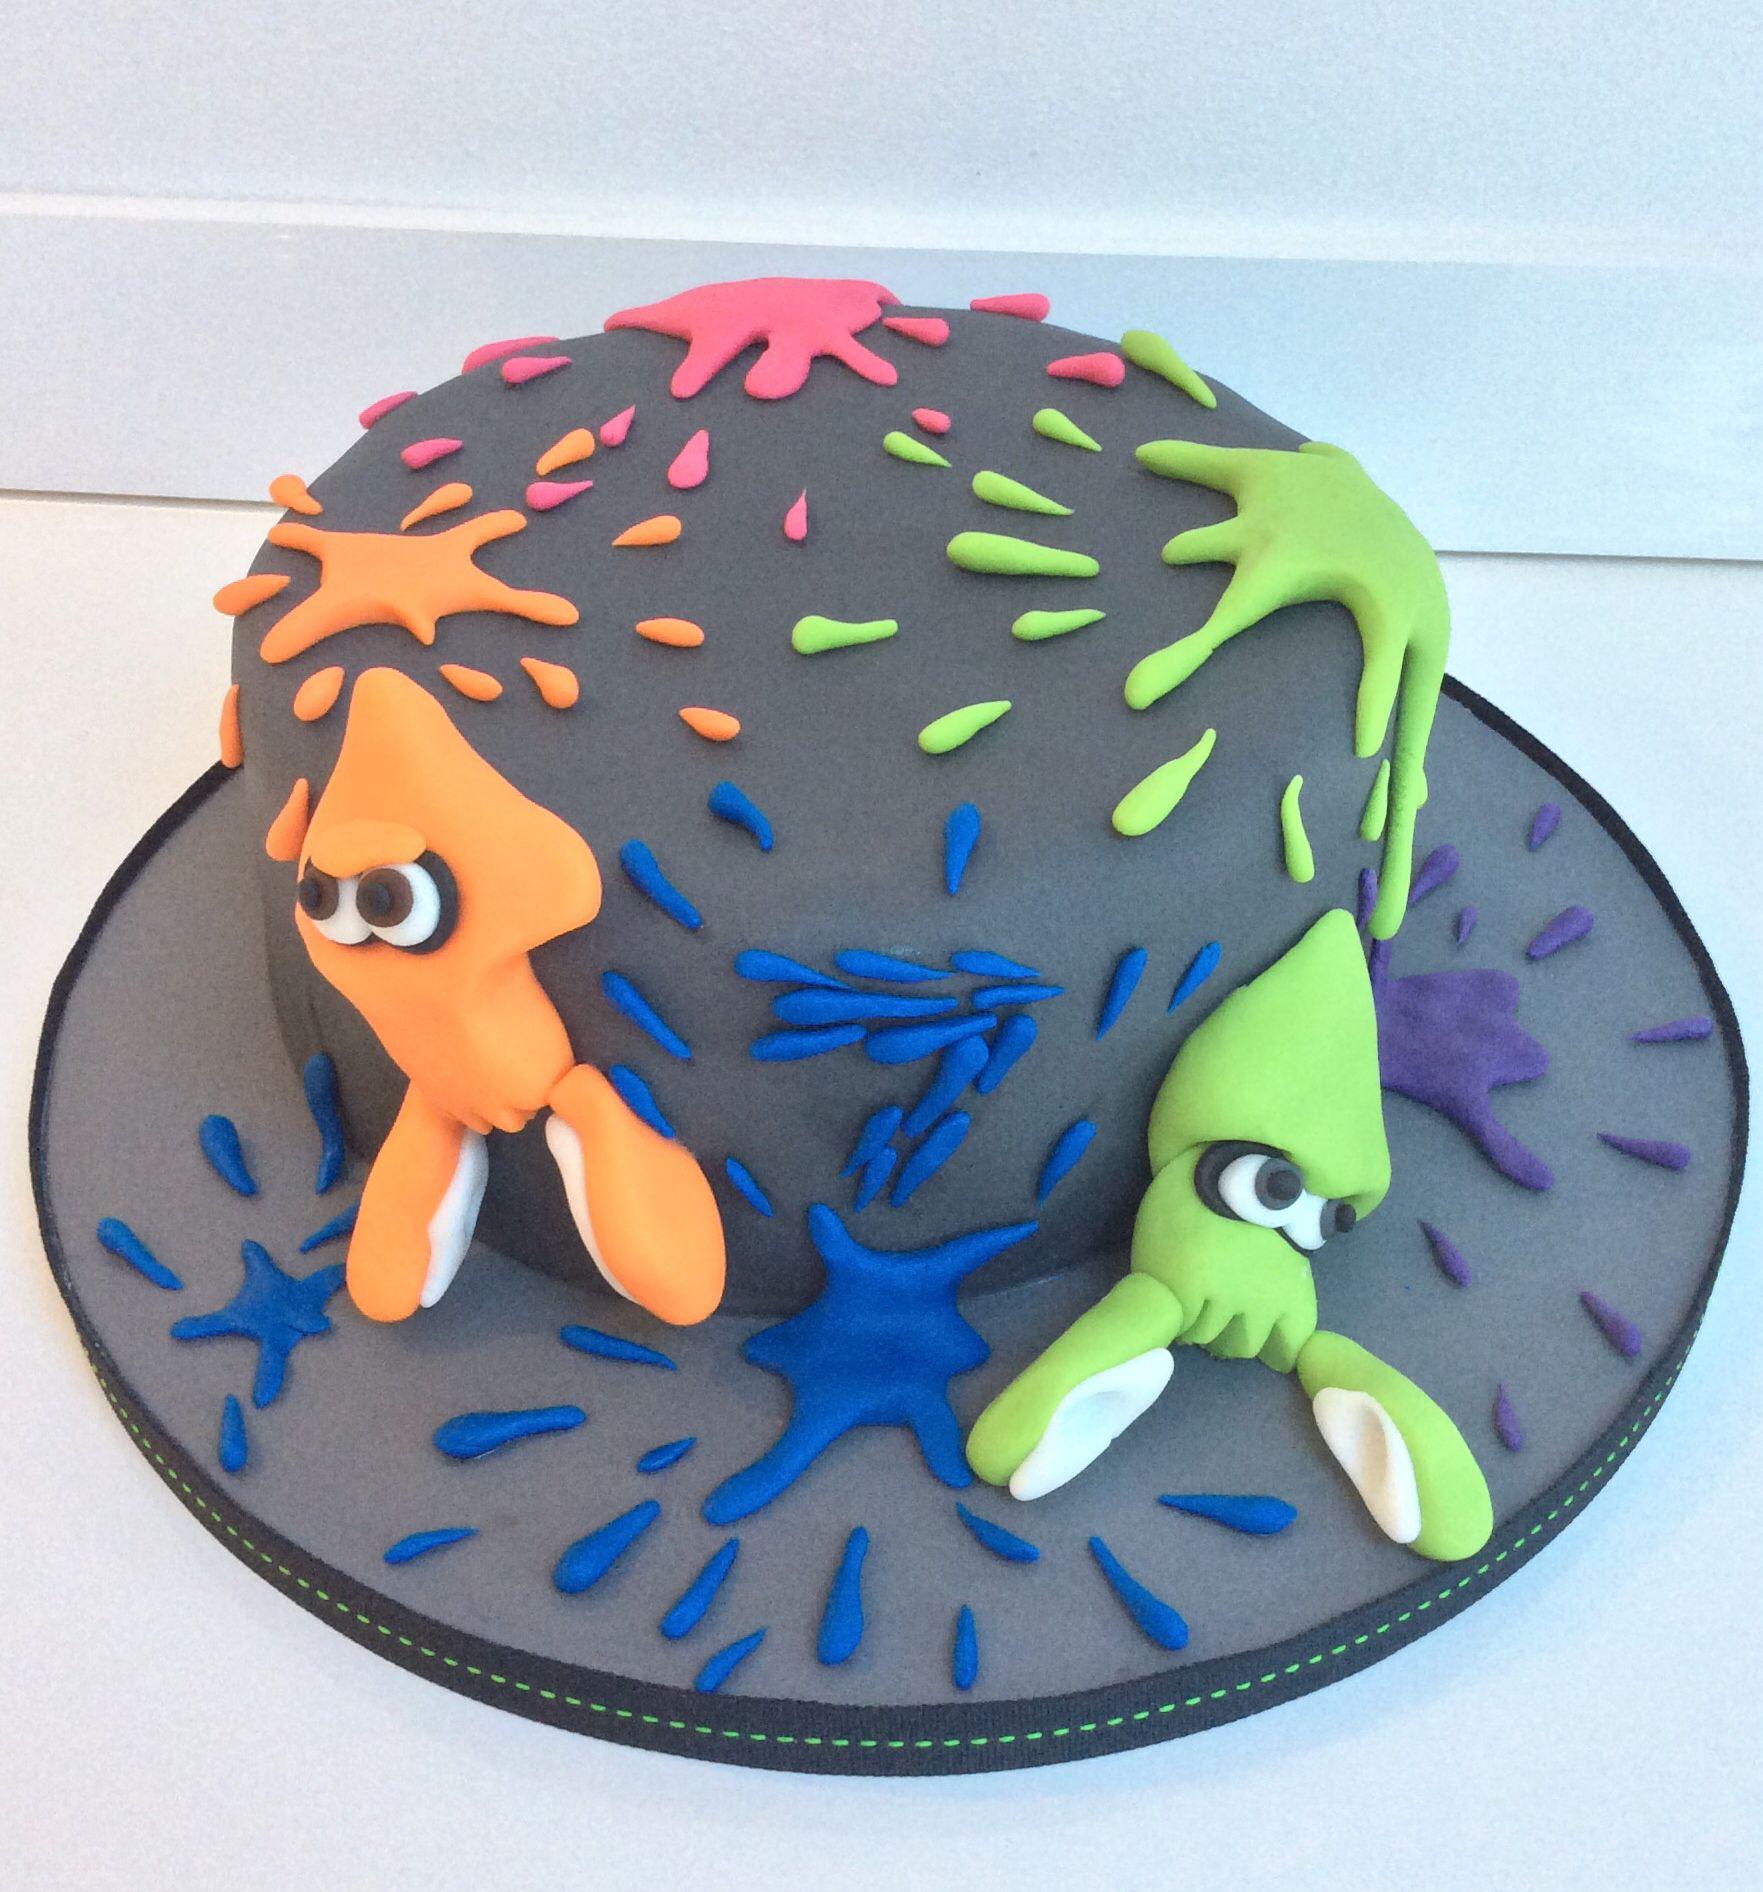 Splatoon Cake In 2019 6th Birthday Cakes Nintendo Party